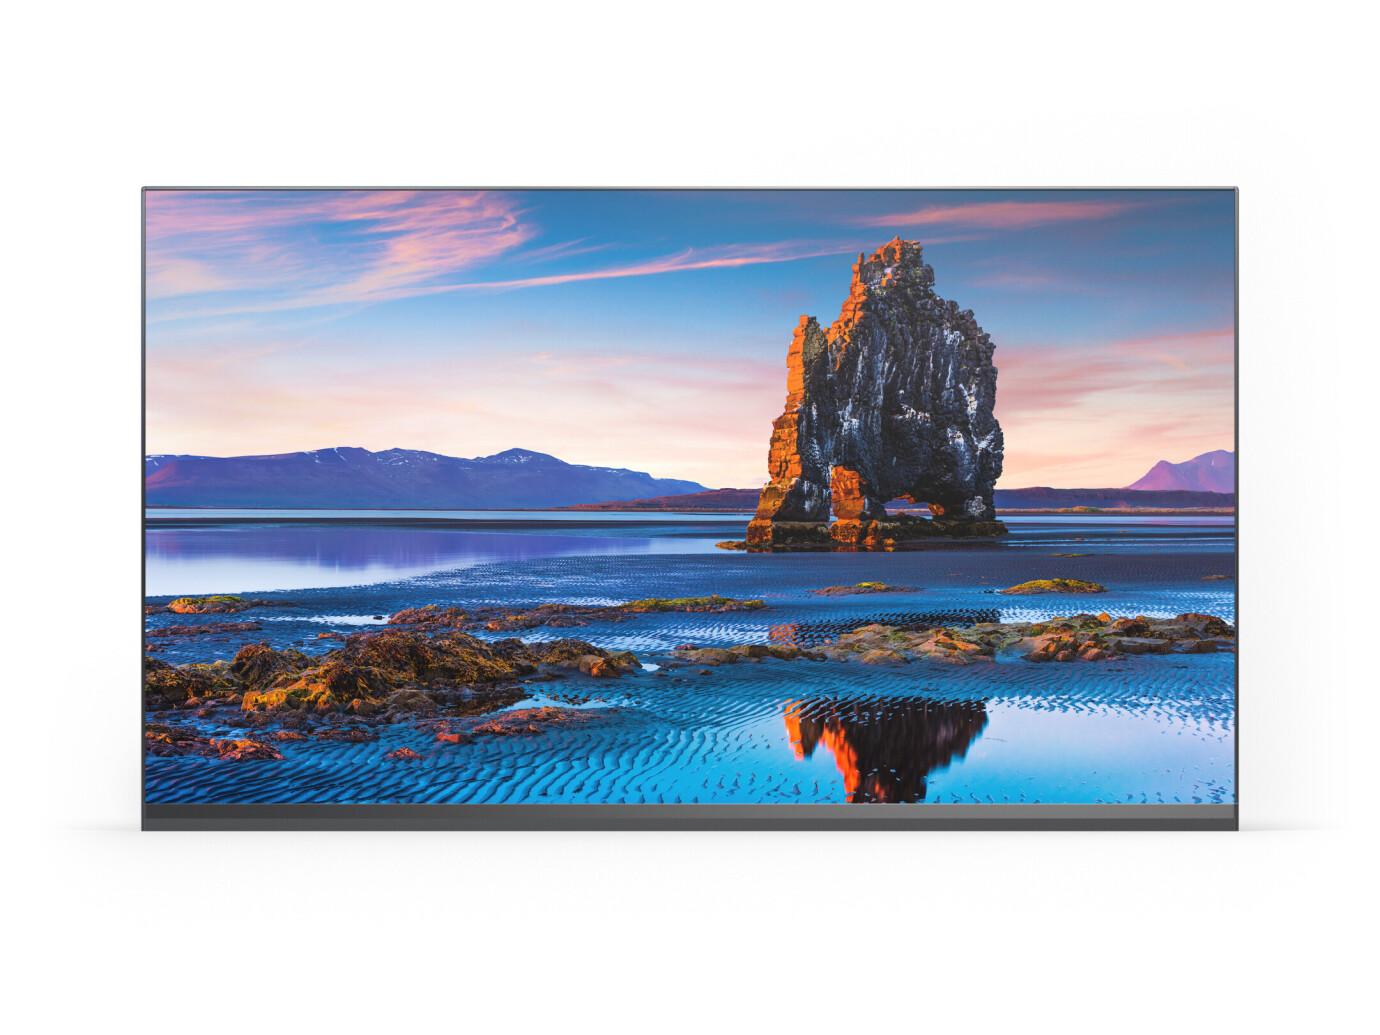 NEC LED-FE015i2-137 - Full HD Paket LED Wall 1,583mm Pixel Pitch